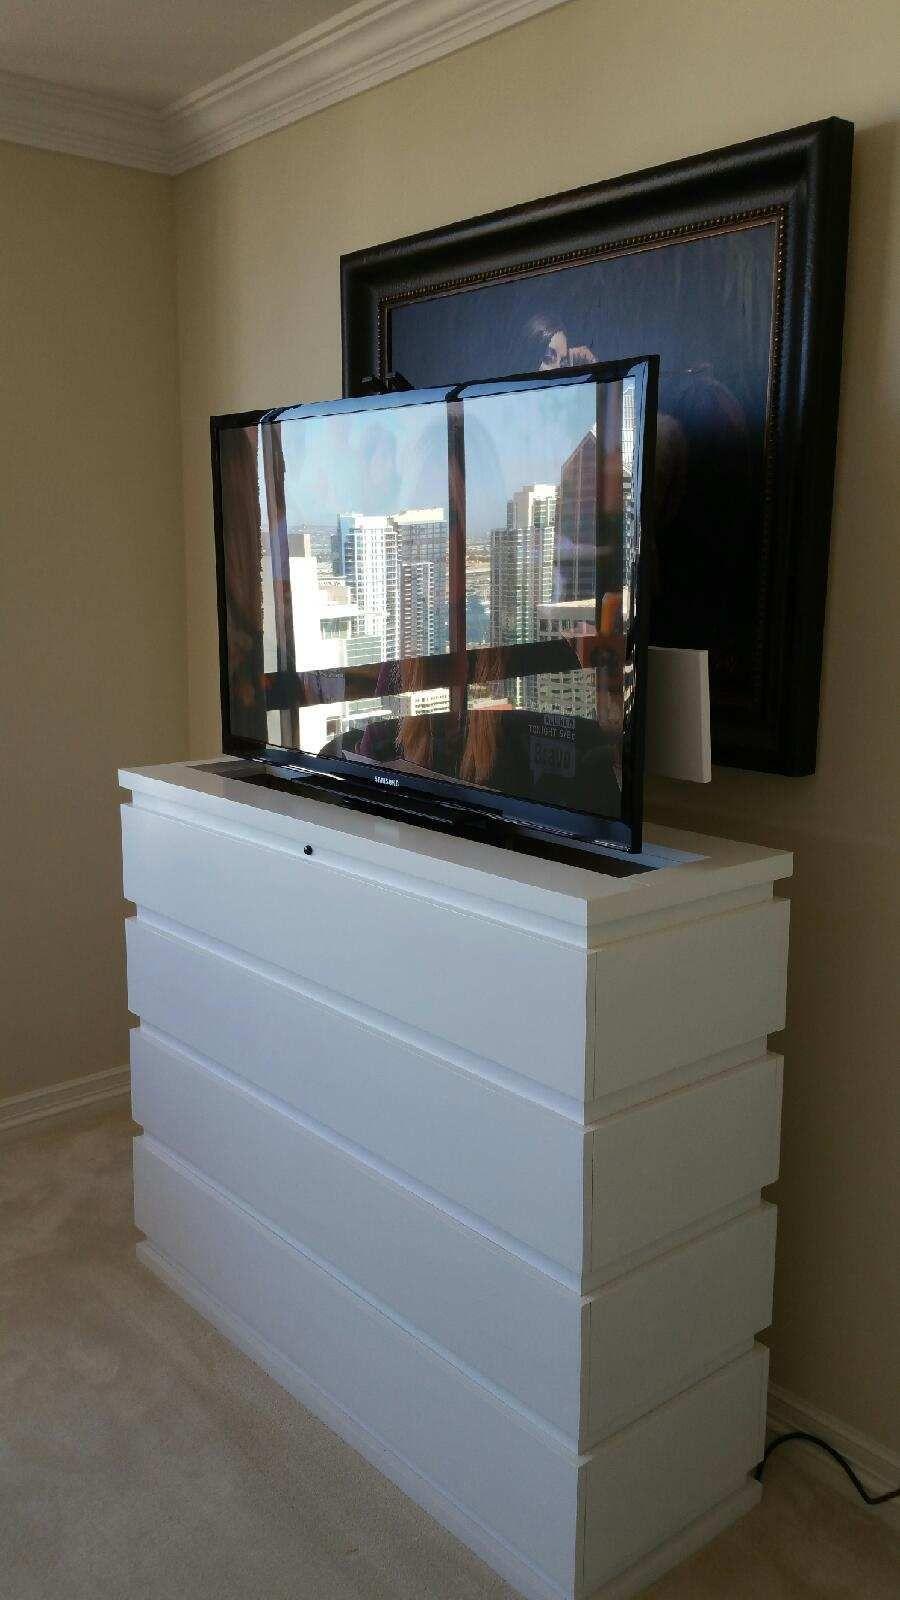 Prism White W Swivel Tv Lift Cabinet Chambres Parentales Appartement Deco